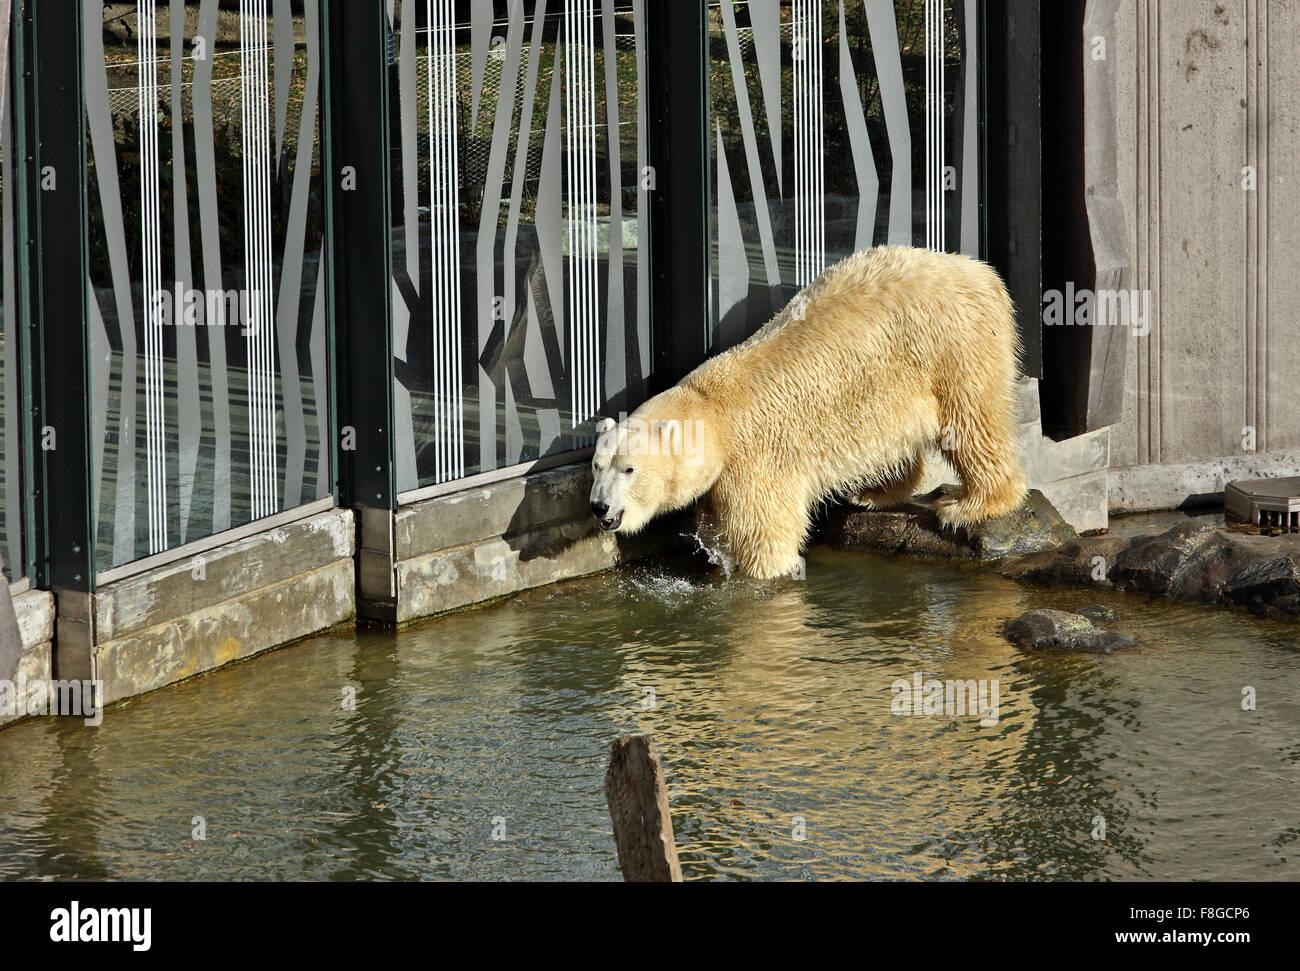 Polar bear in the Zoo (Tiergarden) of Schonbrunn palace, Vienna, Austria. - Stock Image